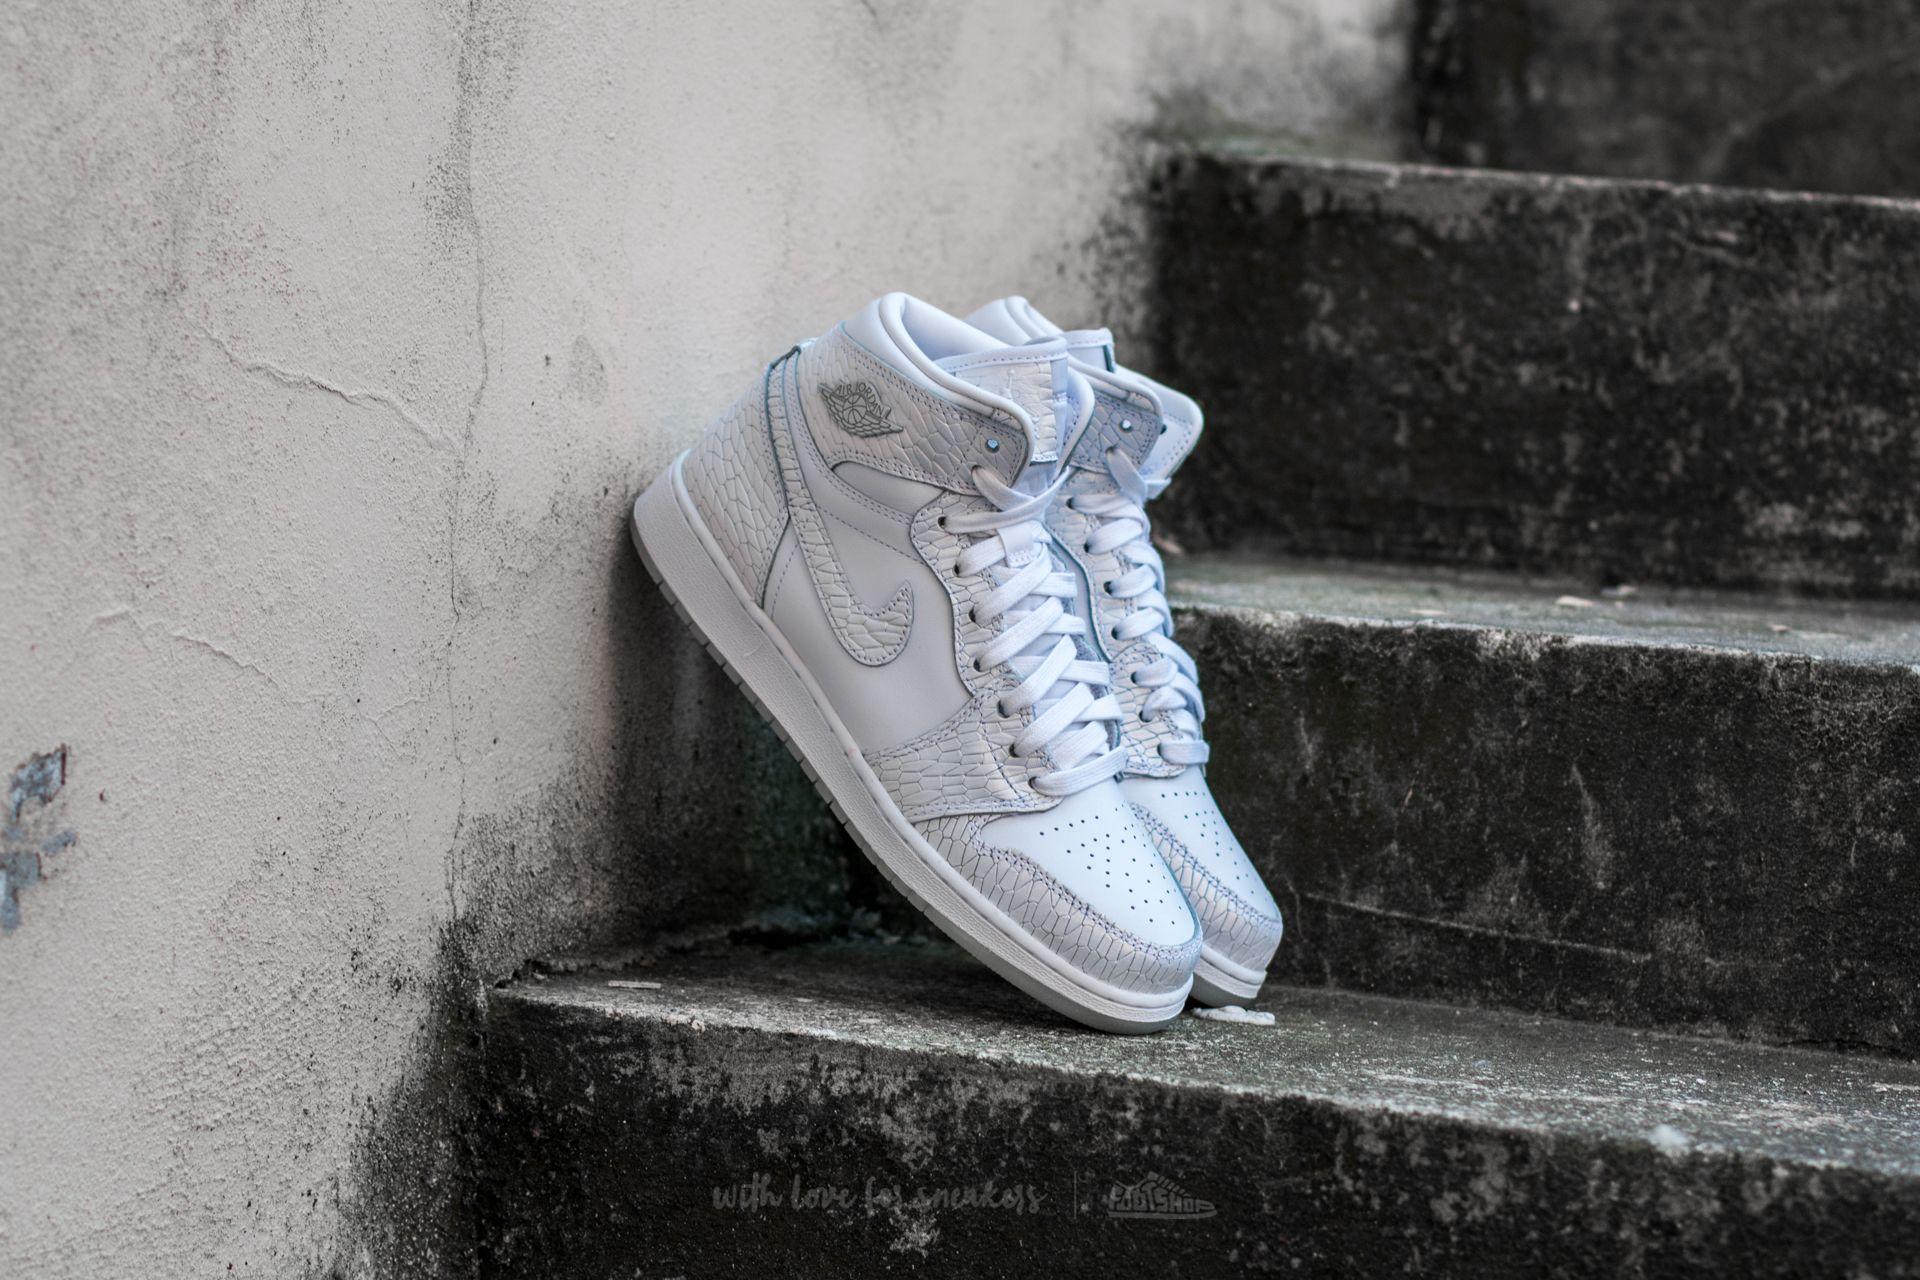 bd4eea8e2447 Air Jordan 1 Retro Hi Premium HC GG White  White-Pure Platinum ...